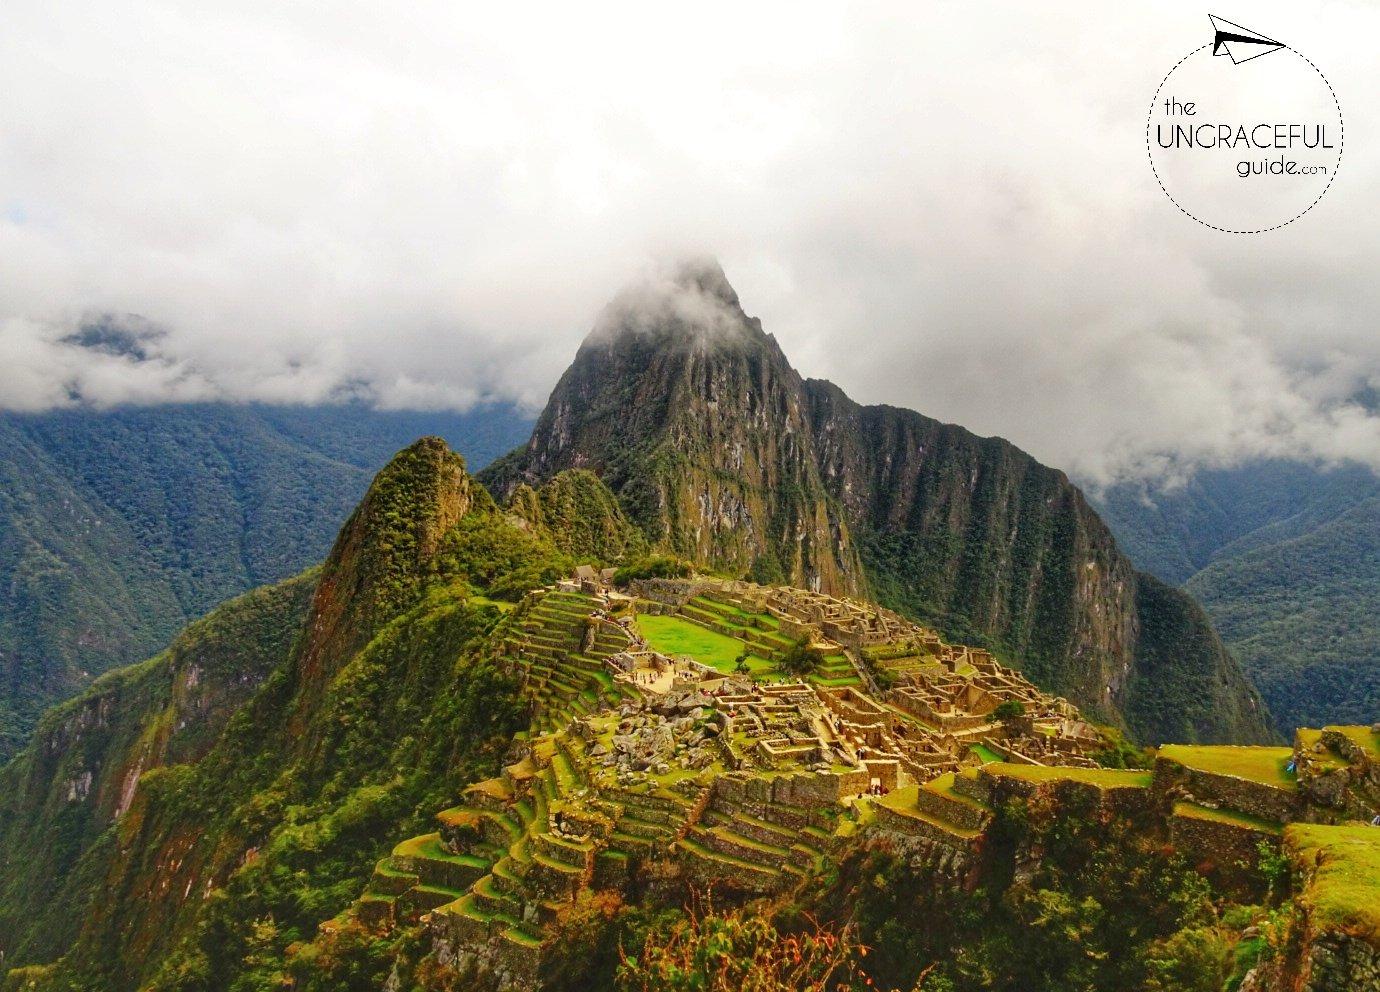 "<img src=""data:image/gif;base64,R0lGODdhAQABAPAAAP///wAAACwAAAAAAQABAEACAkQBADs="" data-lazy-src=""images/"" width=""800"" height=""600"" alt=""machu picchu - wp image 719018947 - Peru: Our DIY Hike To Machu Picchu"">"